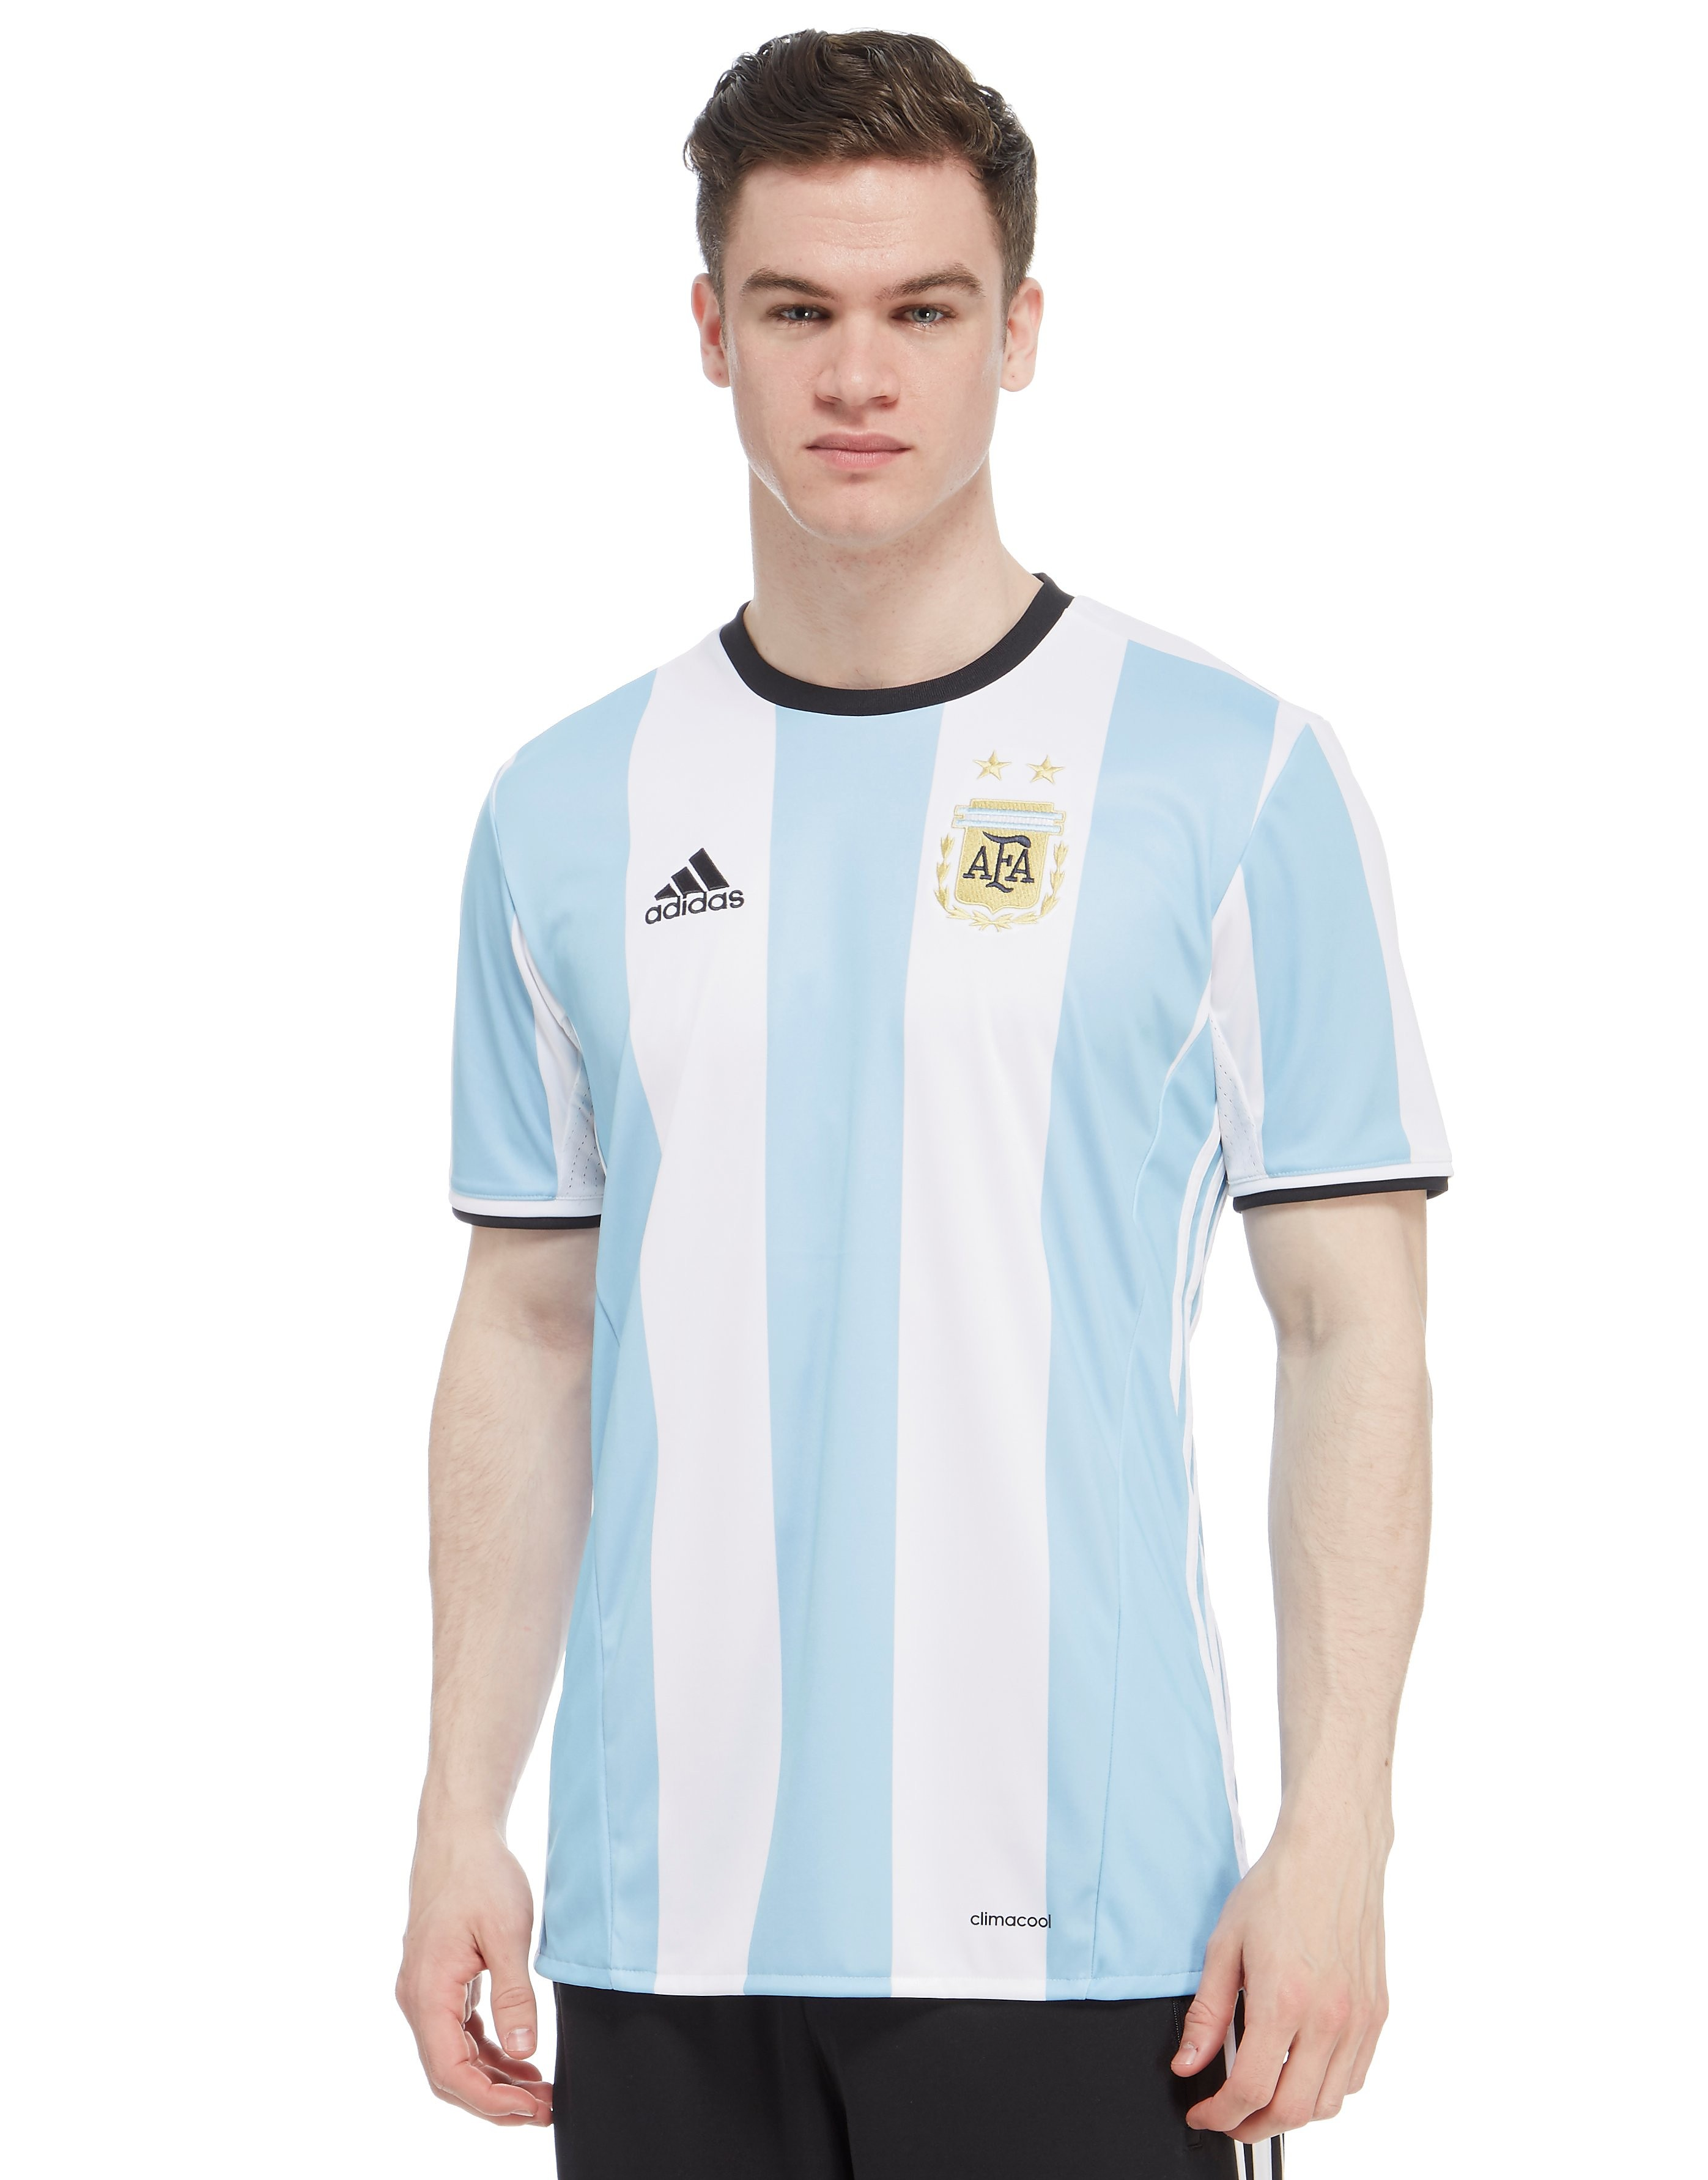 adidas Argentina 2016 Home Shirt